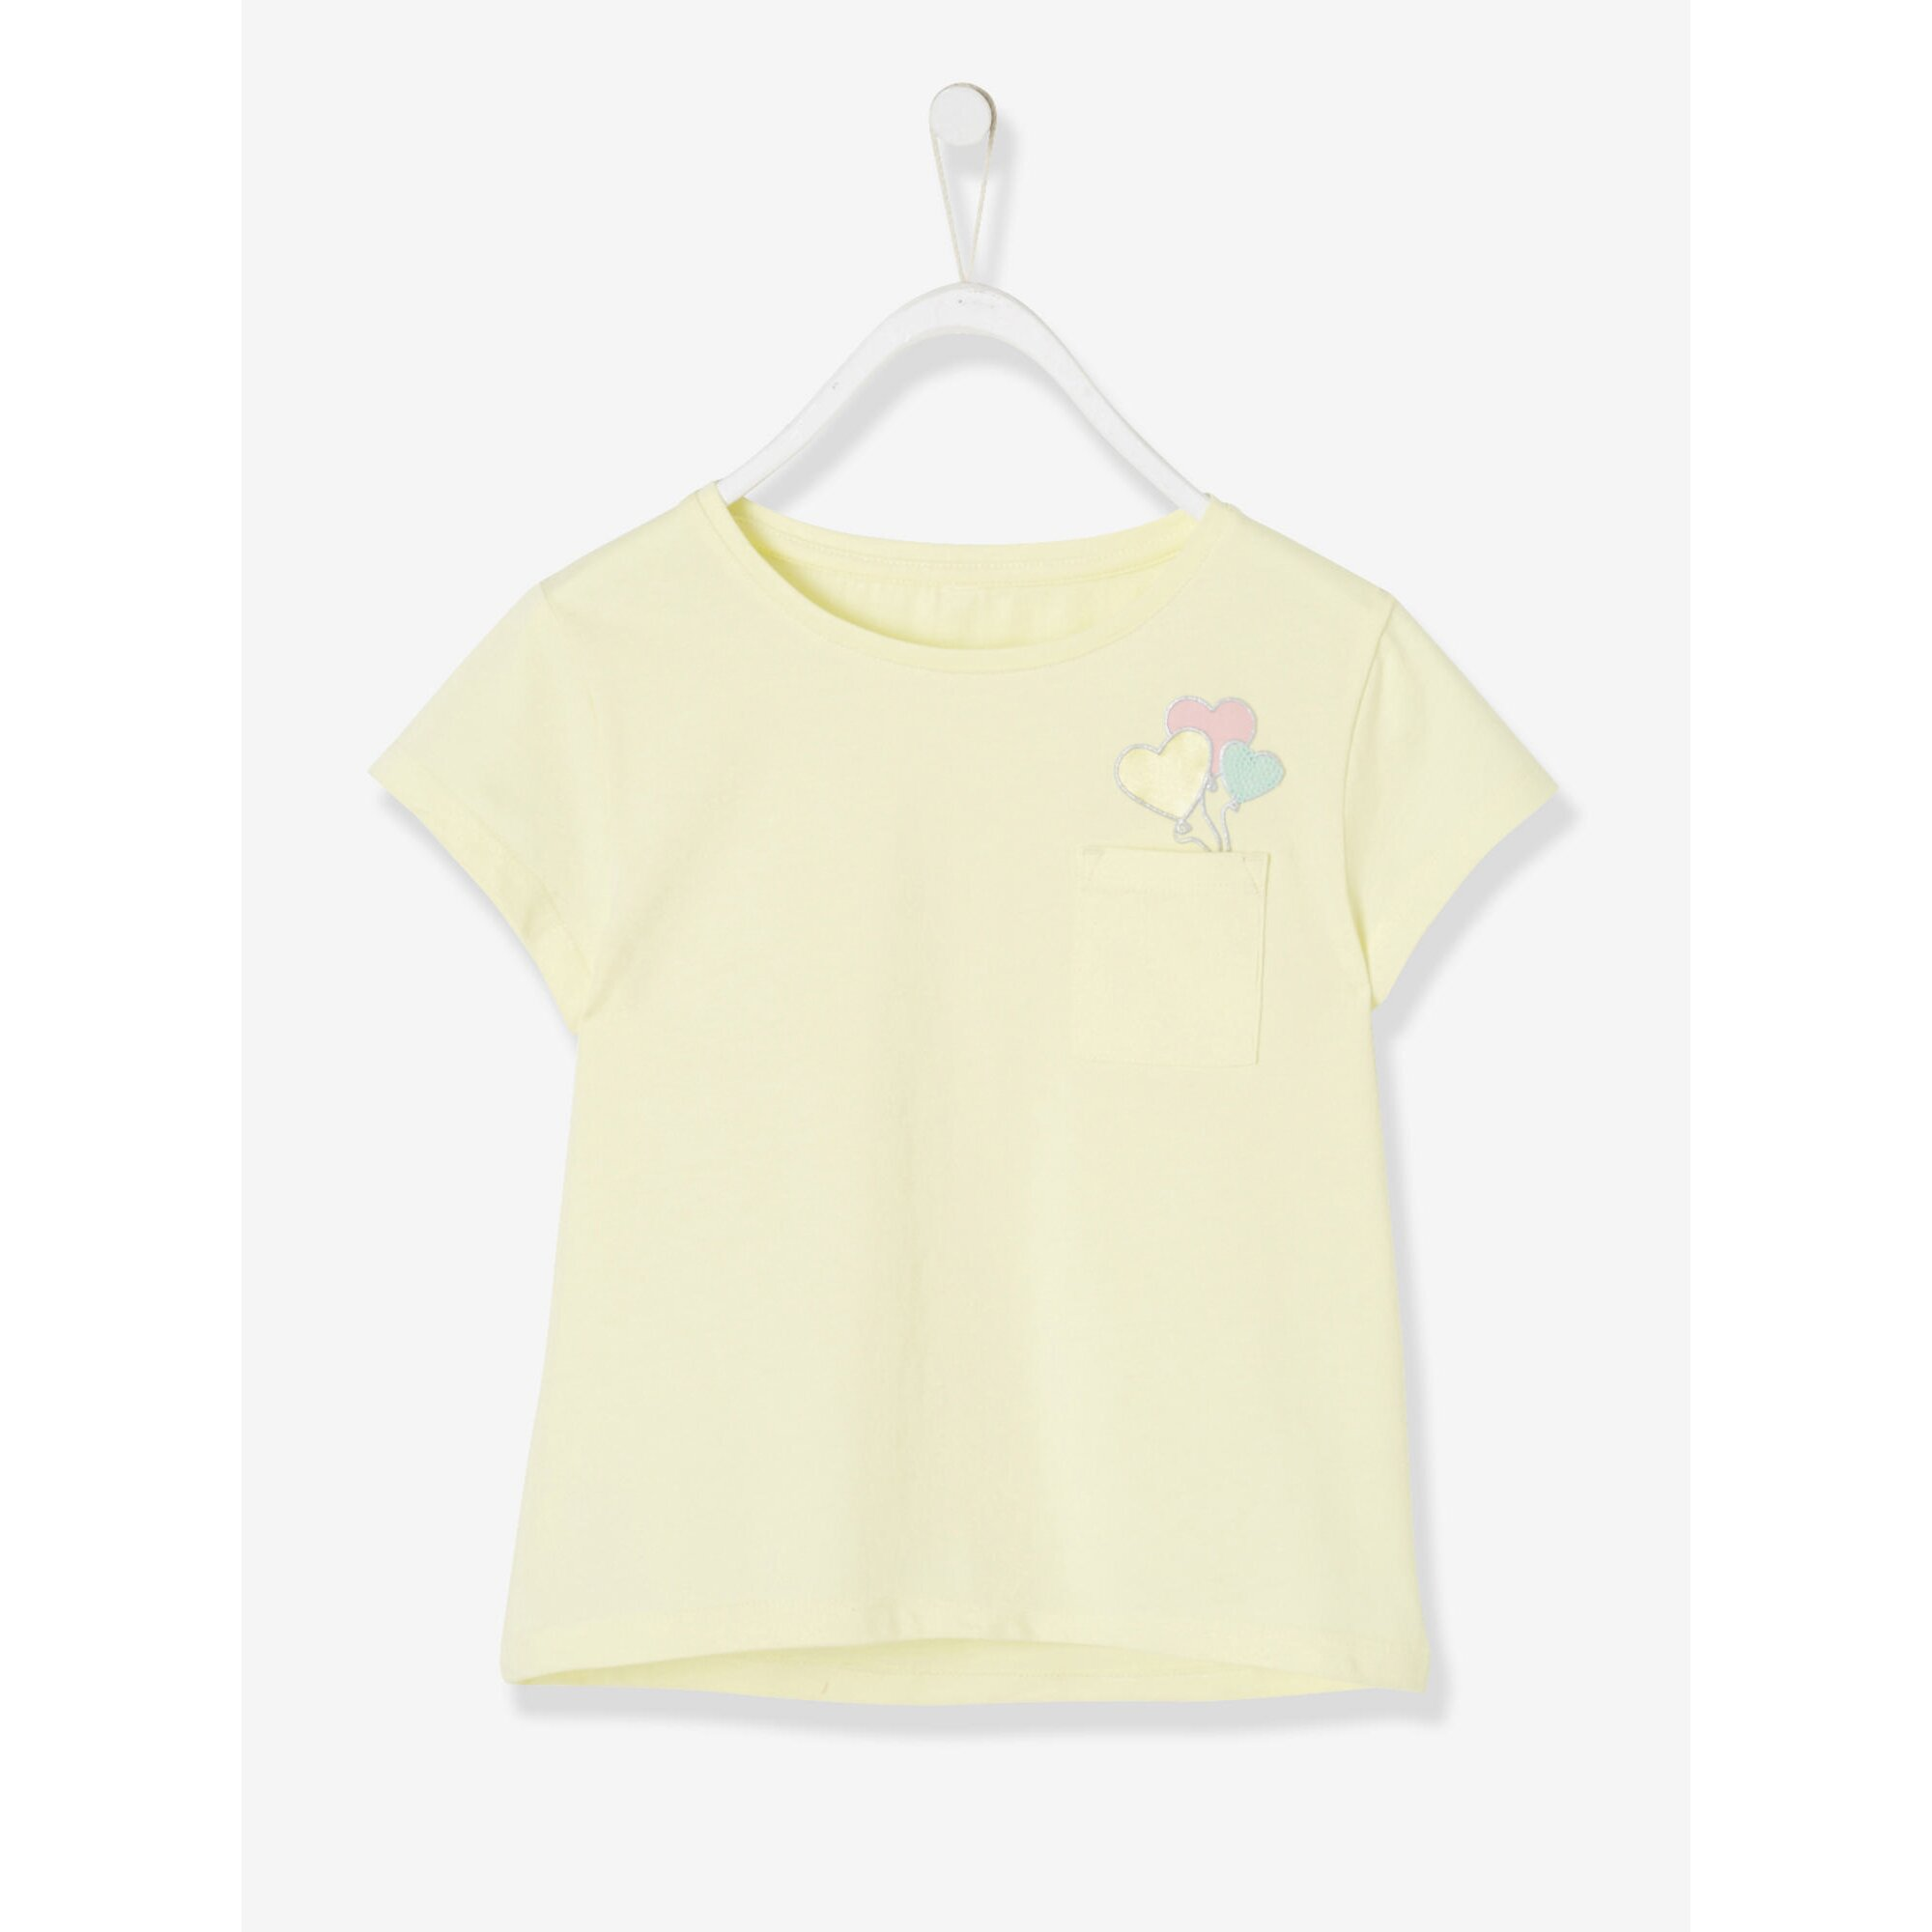 Vertbaudet T-Shirt für Mädchen, Ballons